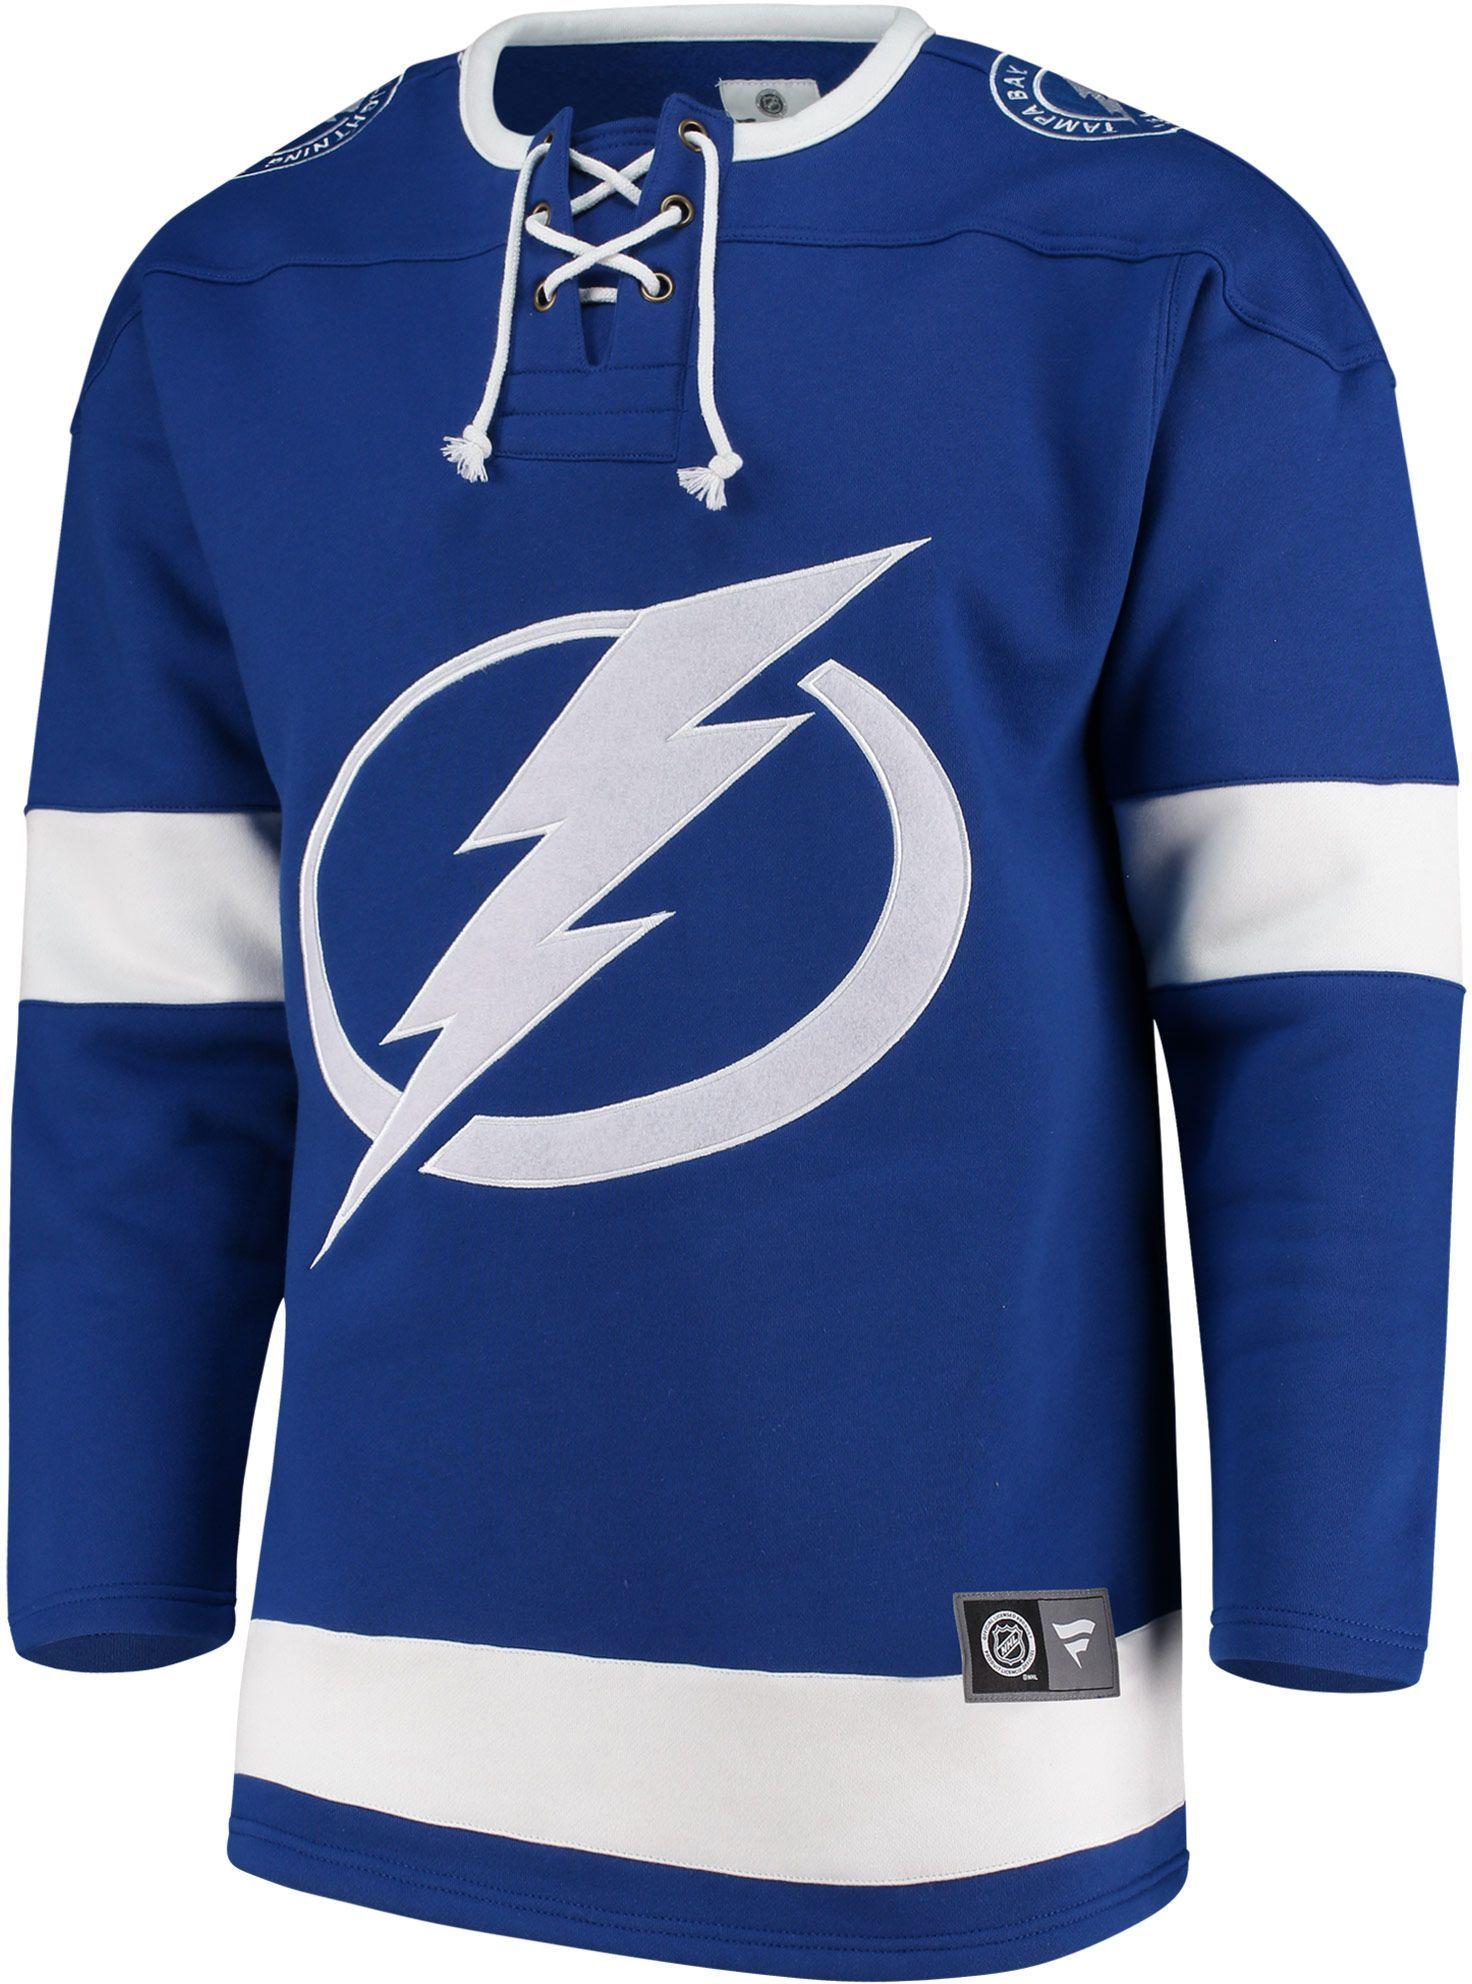 best cheap ee9f6 ec2a6 NHL Men s Tampa Bay Lightning Breakaway Blue Sweatshirt, Size  Medium